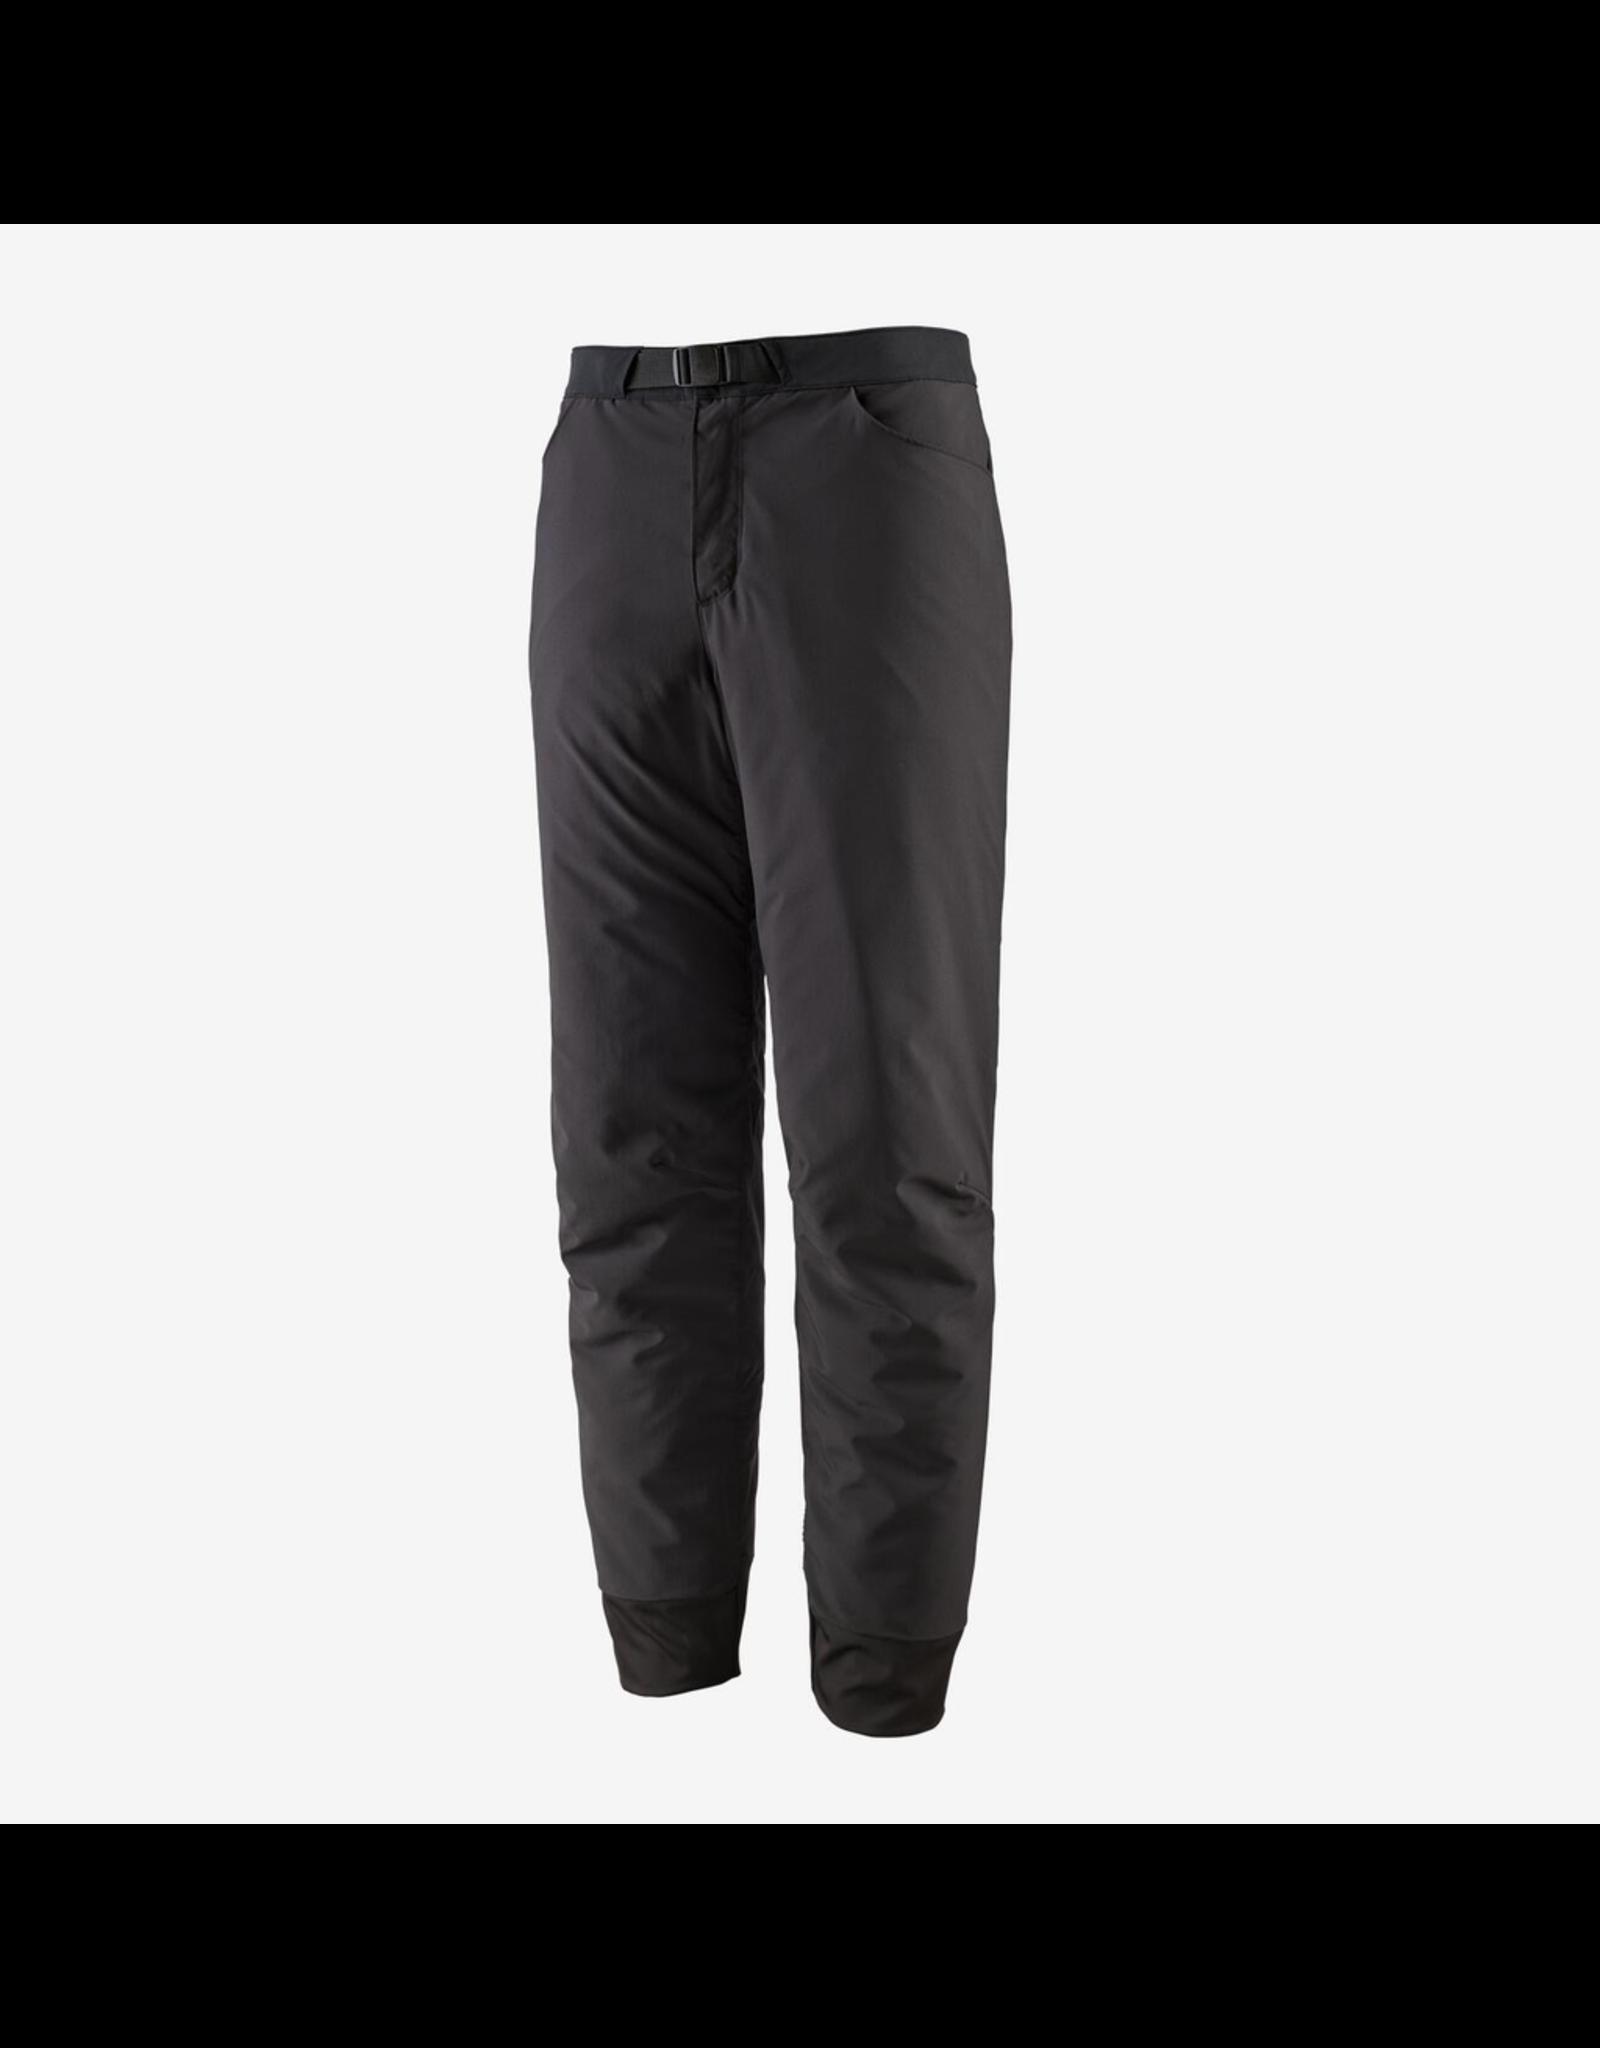 Patagonia; Men's Tough Puff Pants